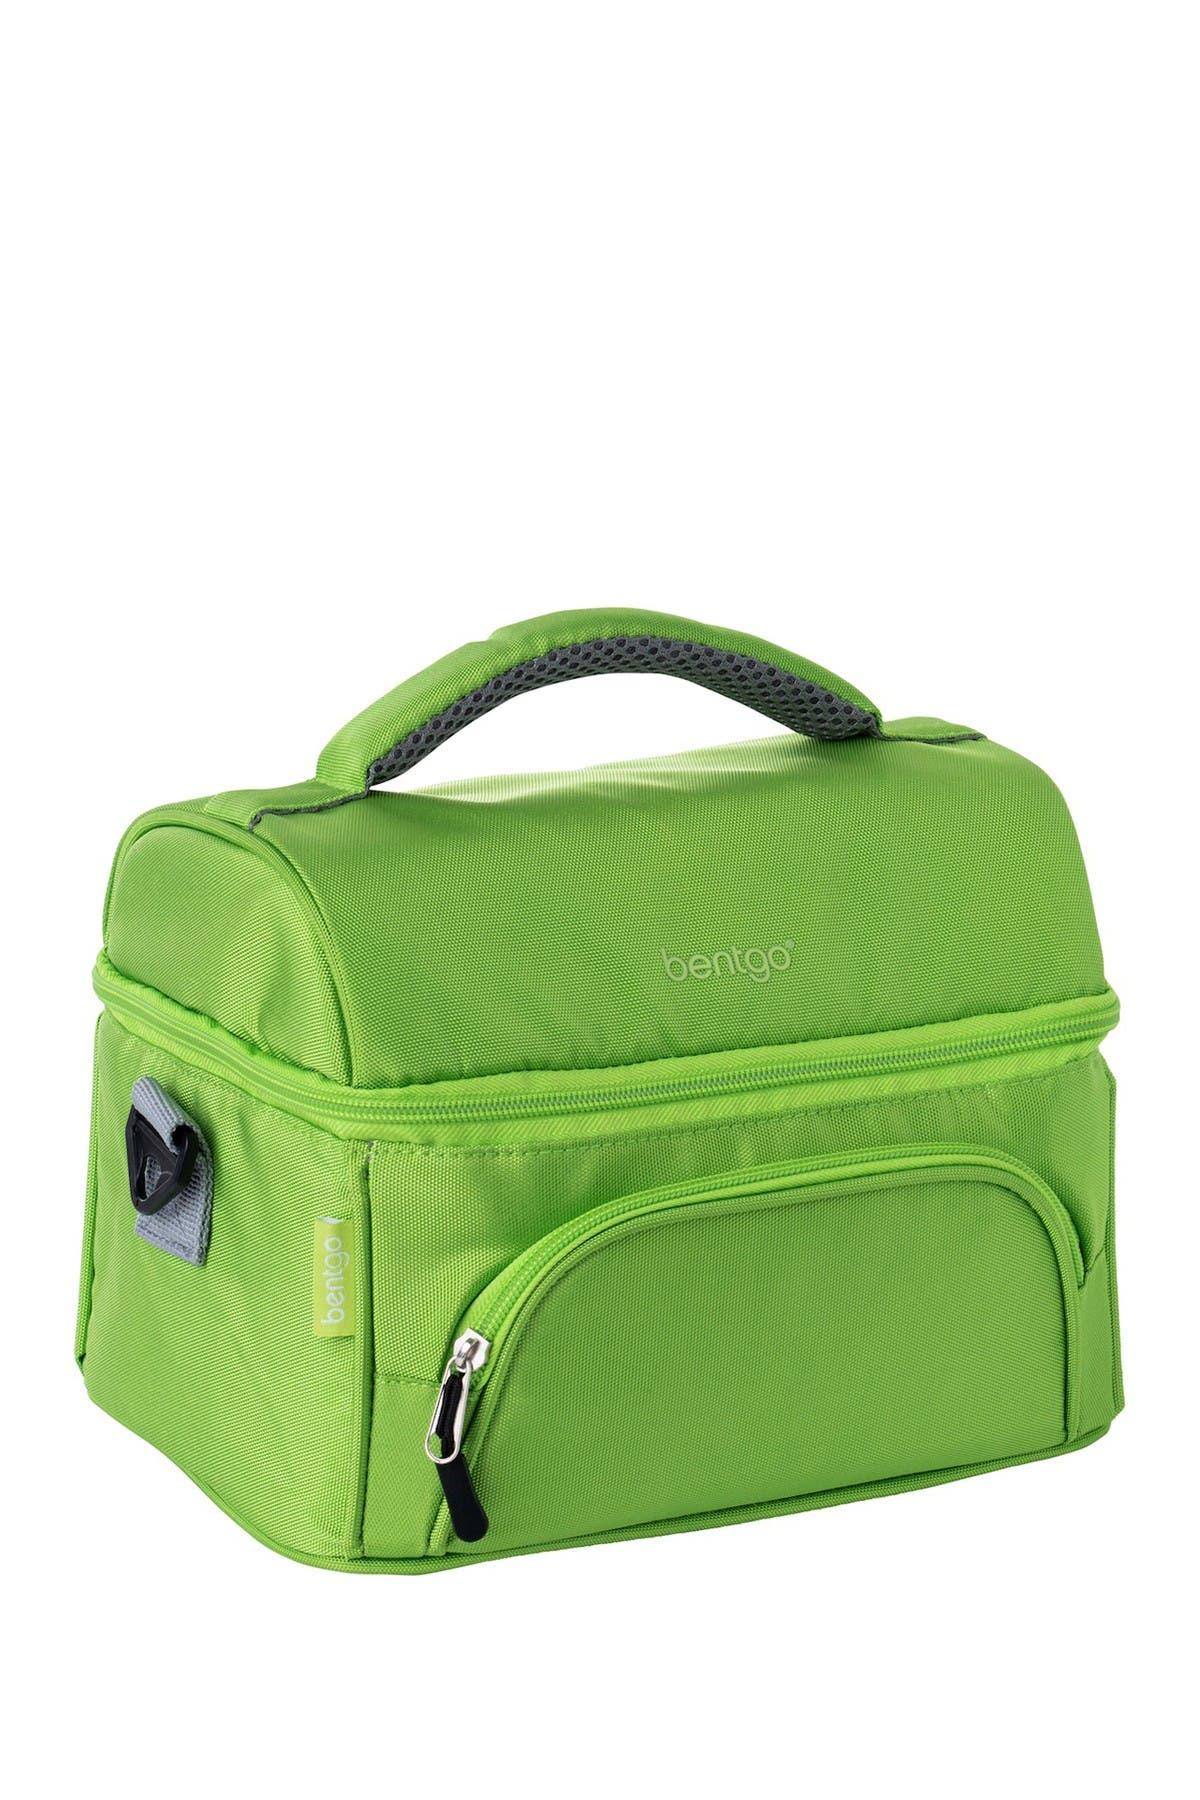 Image of BENTGO Deluxe Lunch Bag - Green